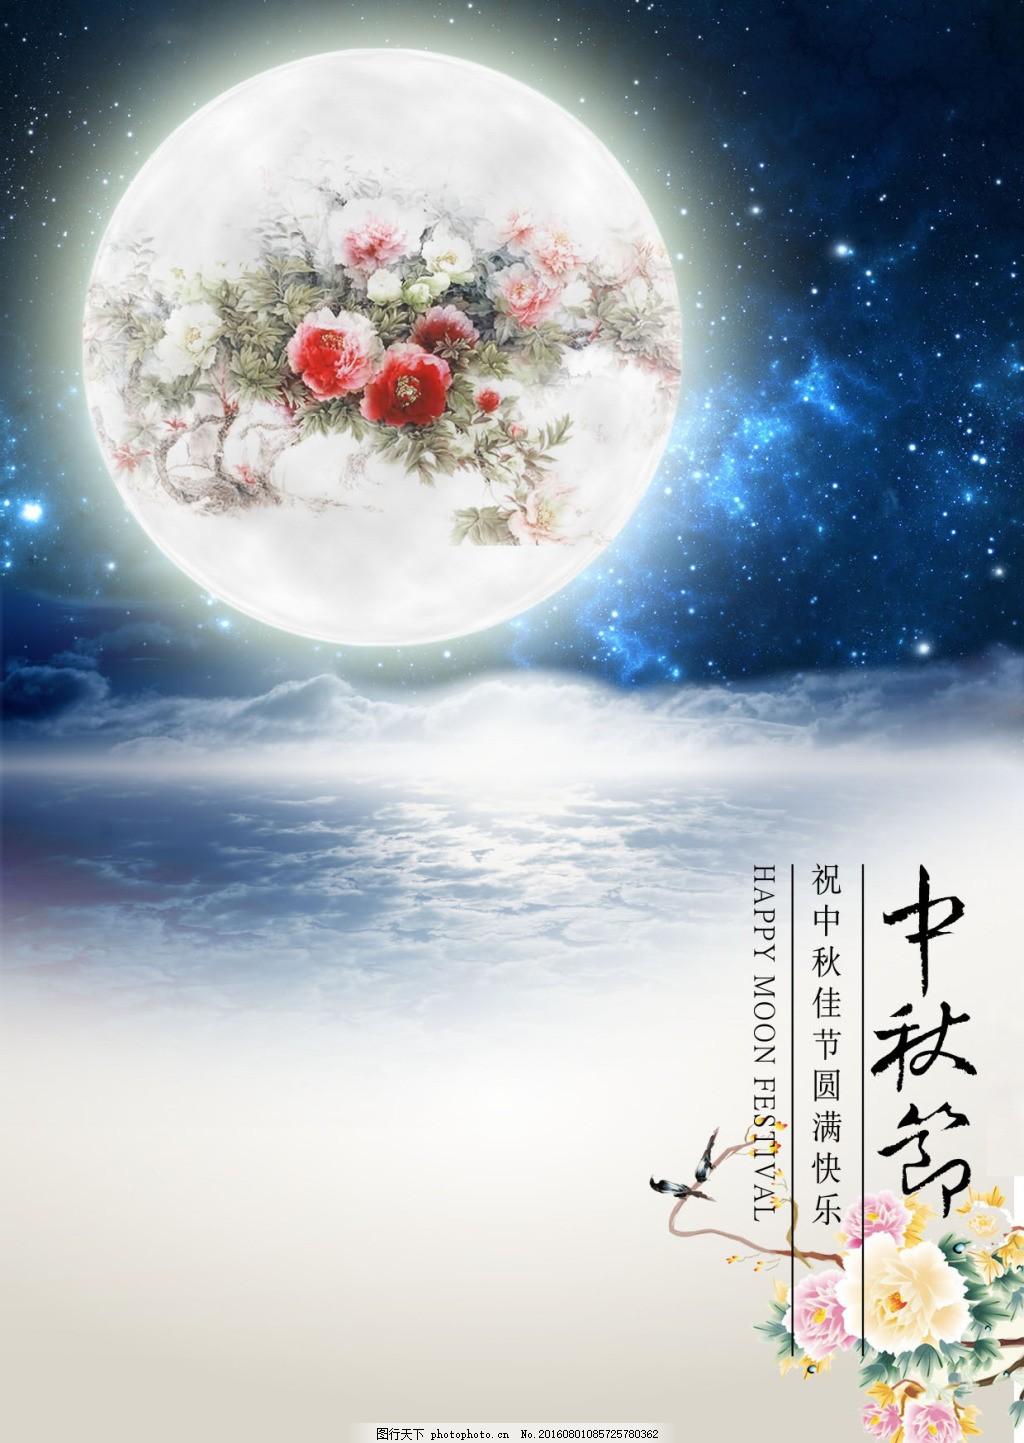 蓝色月光侦探礹.+y��_中秋牡丹 芙蓉 月亮 月光 蓝色星河 白色